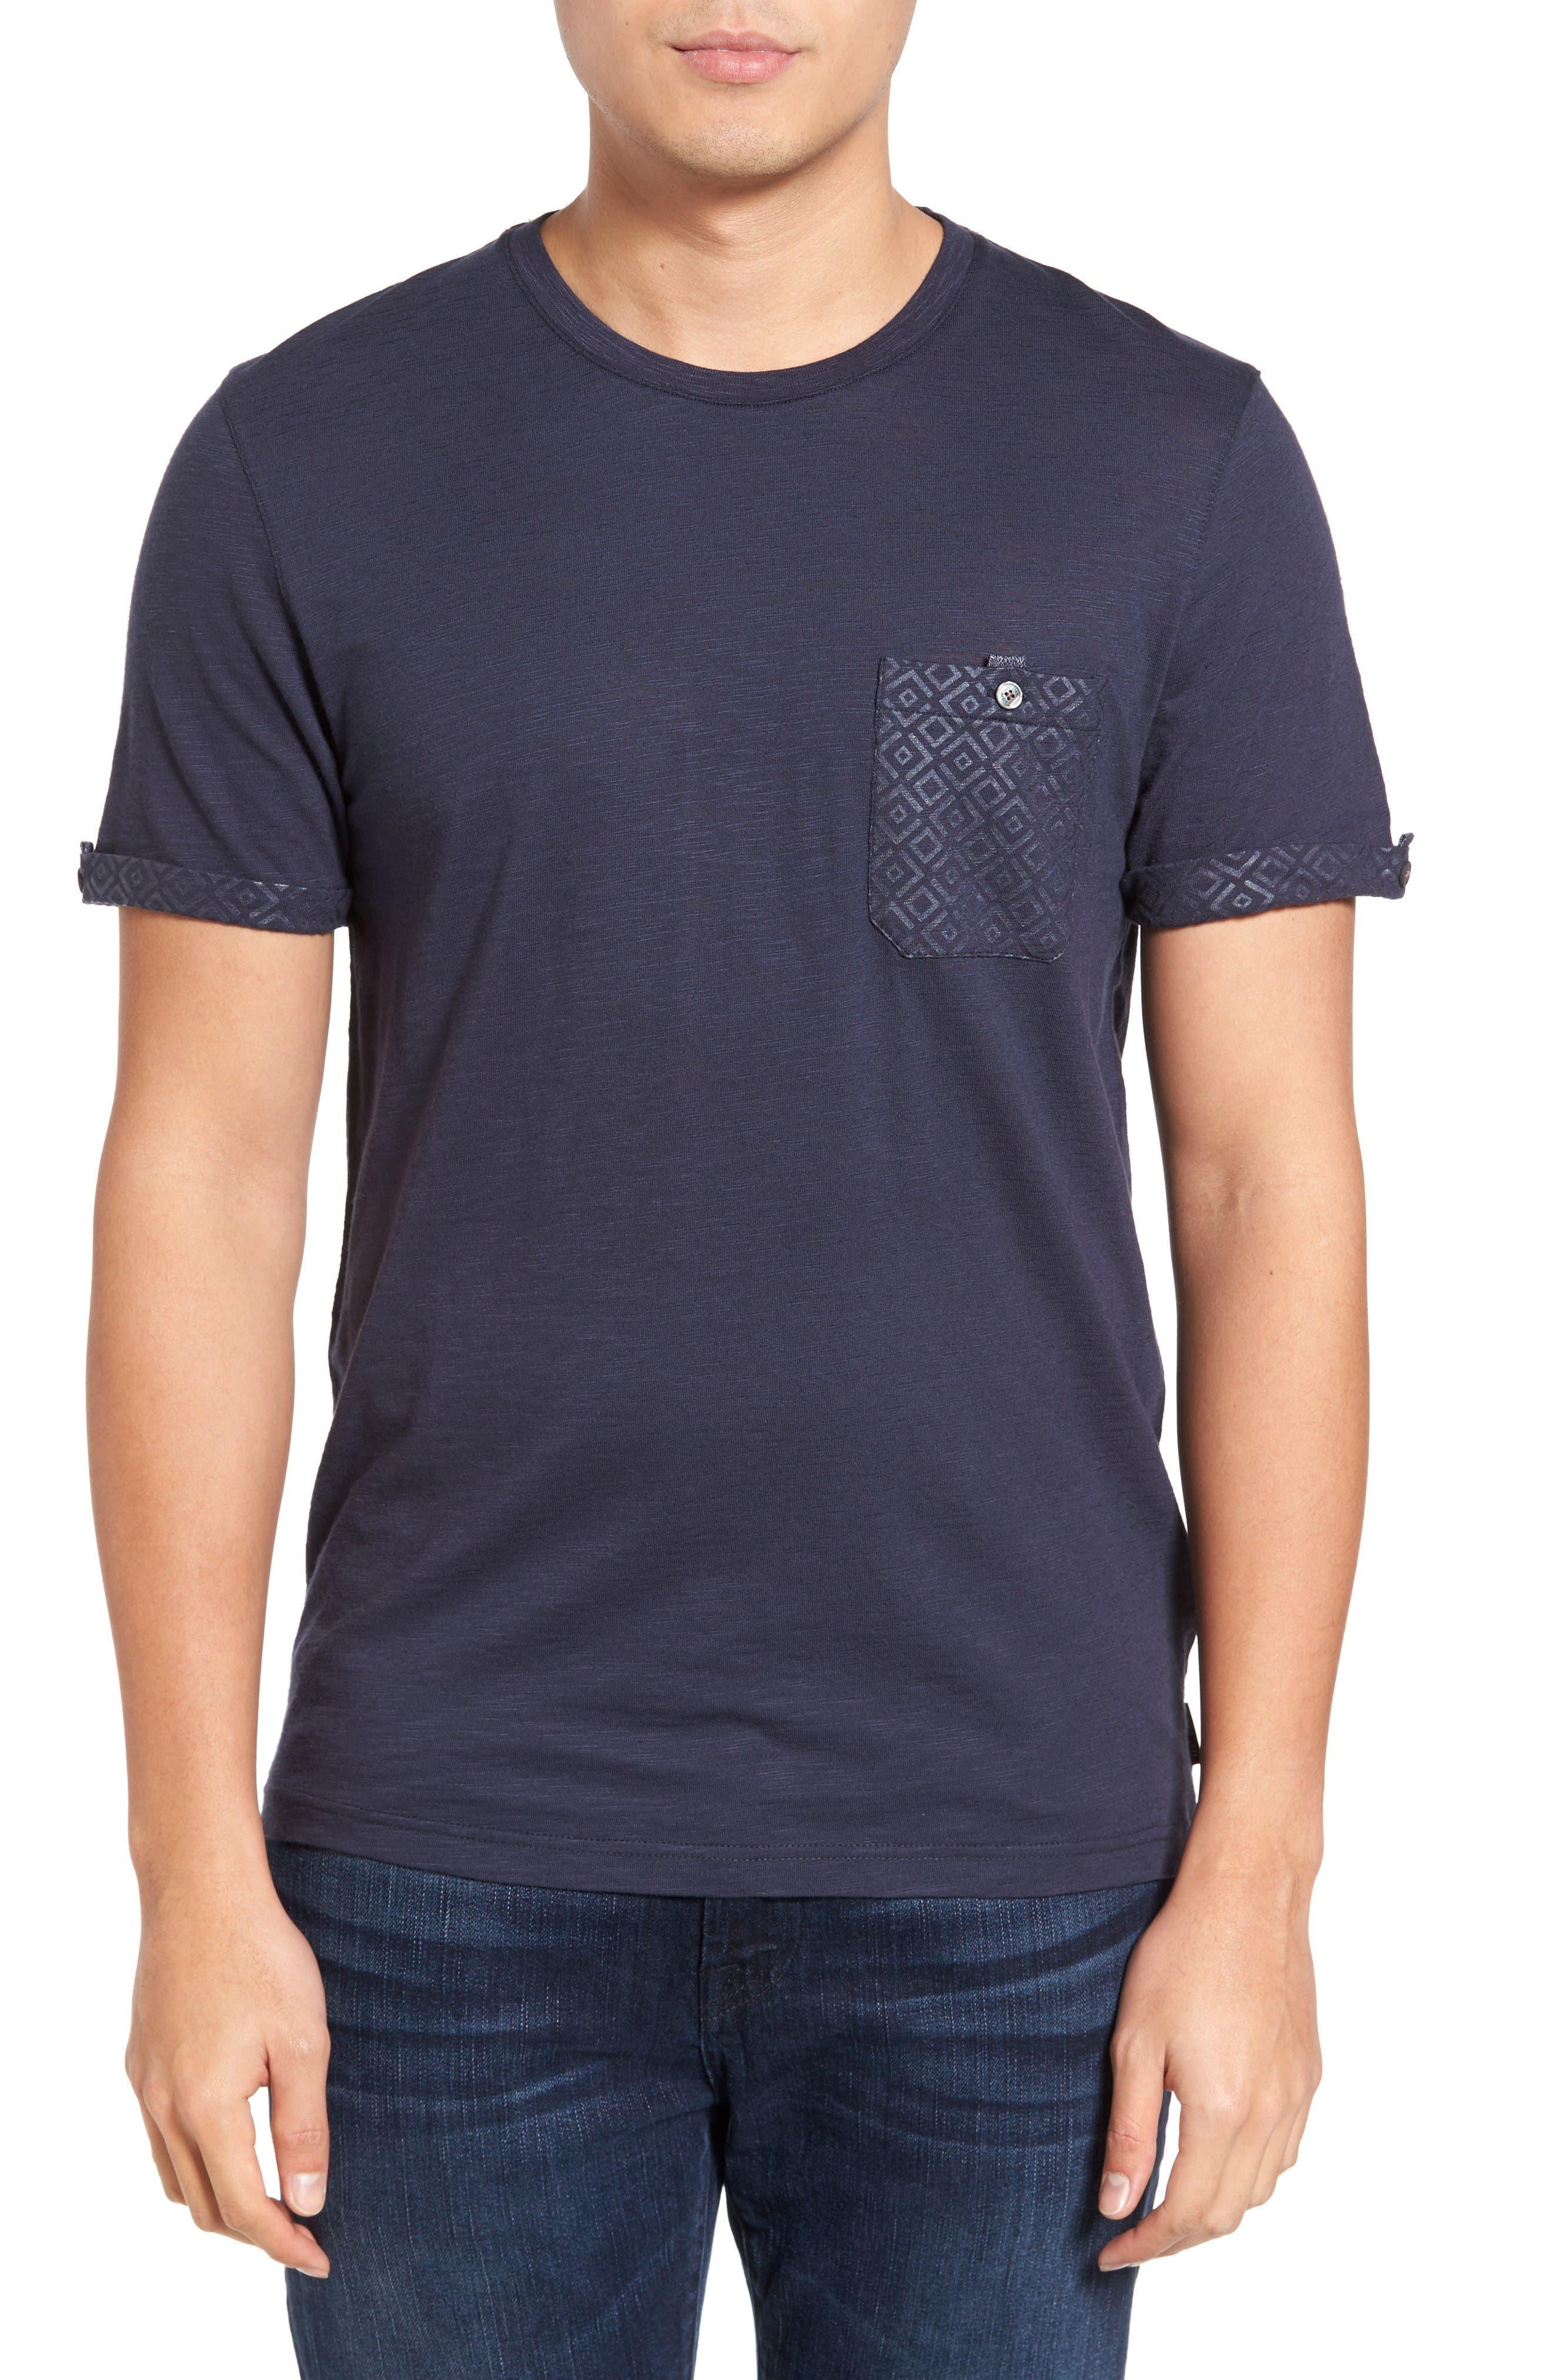 Apel Print Pocket T-Shirt,                         Main,                         color, Navy